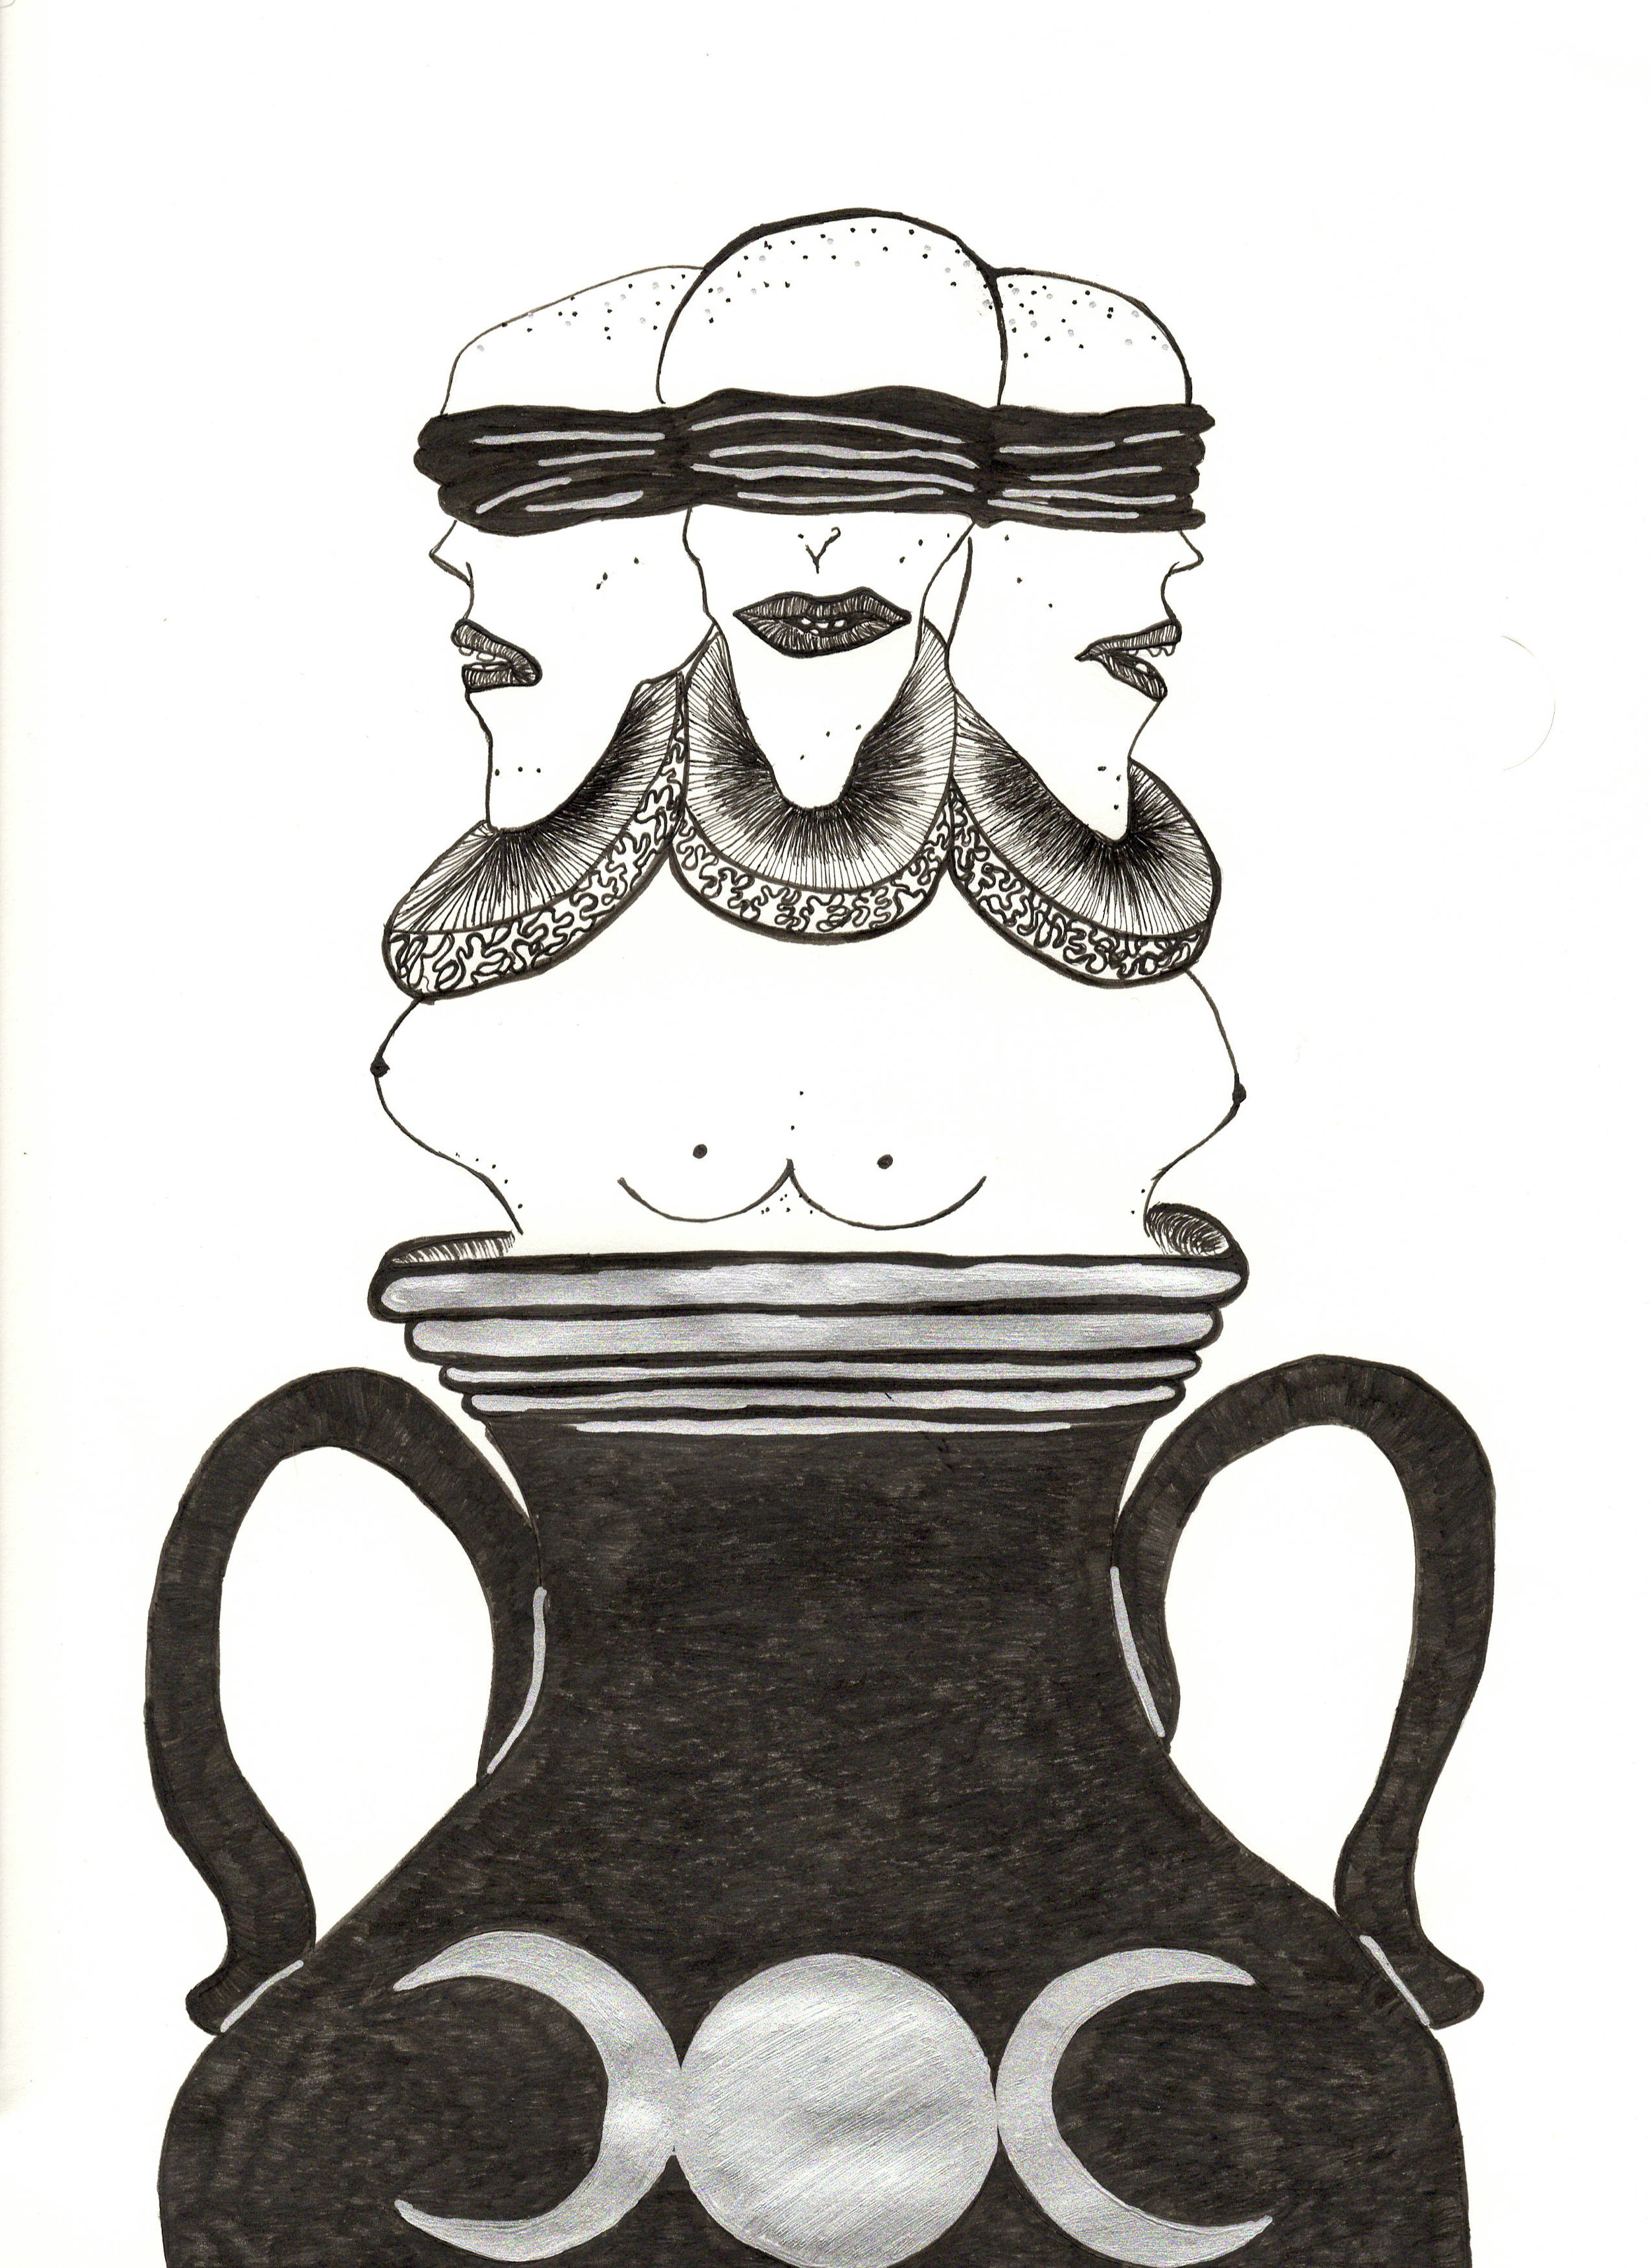 Hekate Amphora